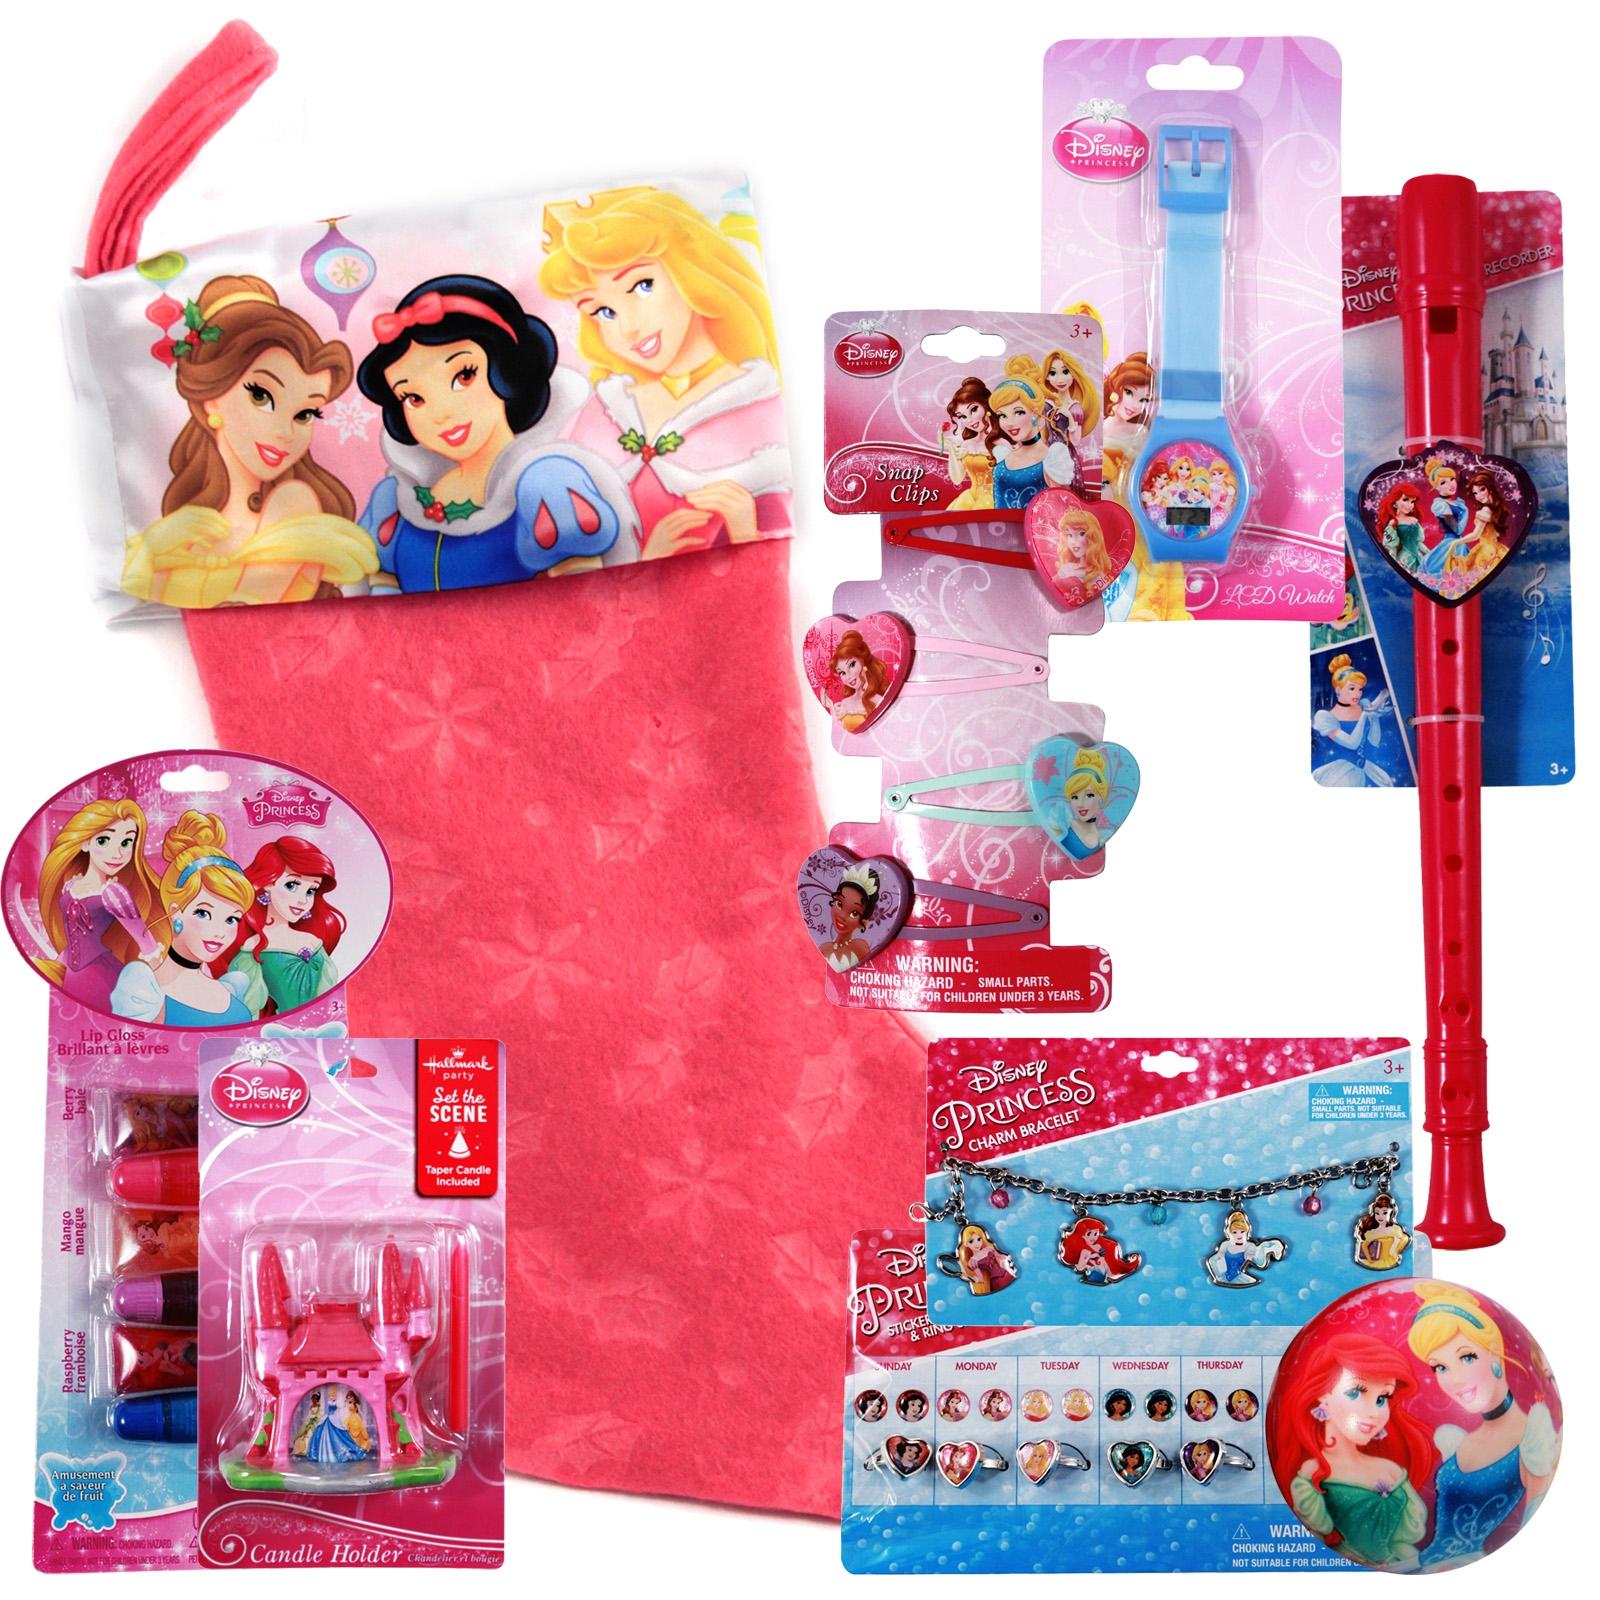 Disney Princess Stocking Stuffer Cinderella, Snow White, Aurora, Belle, Girls Gift Set